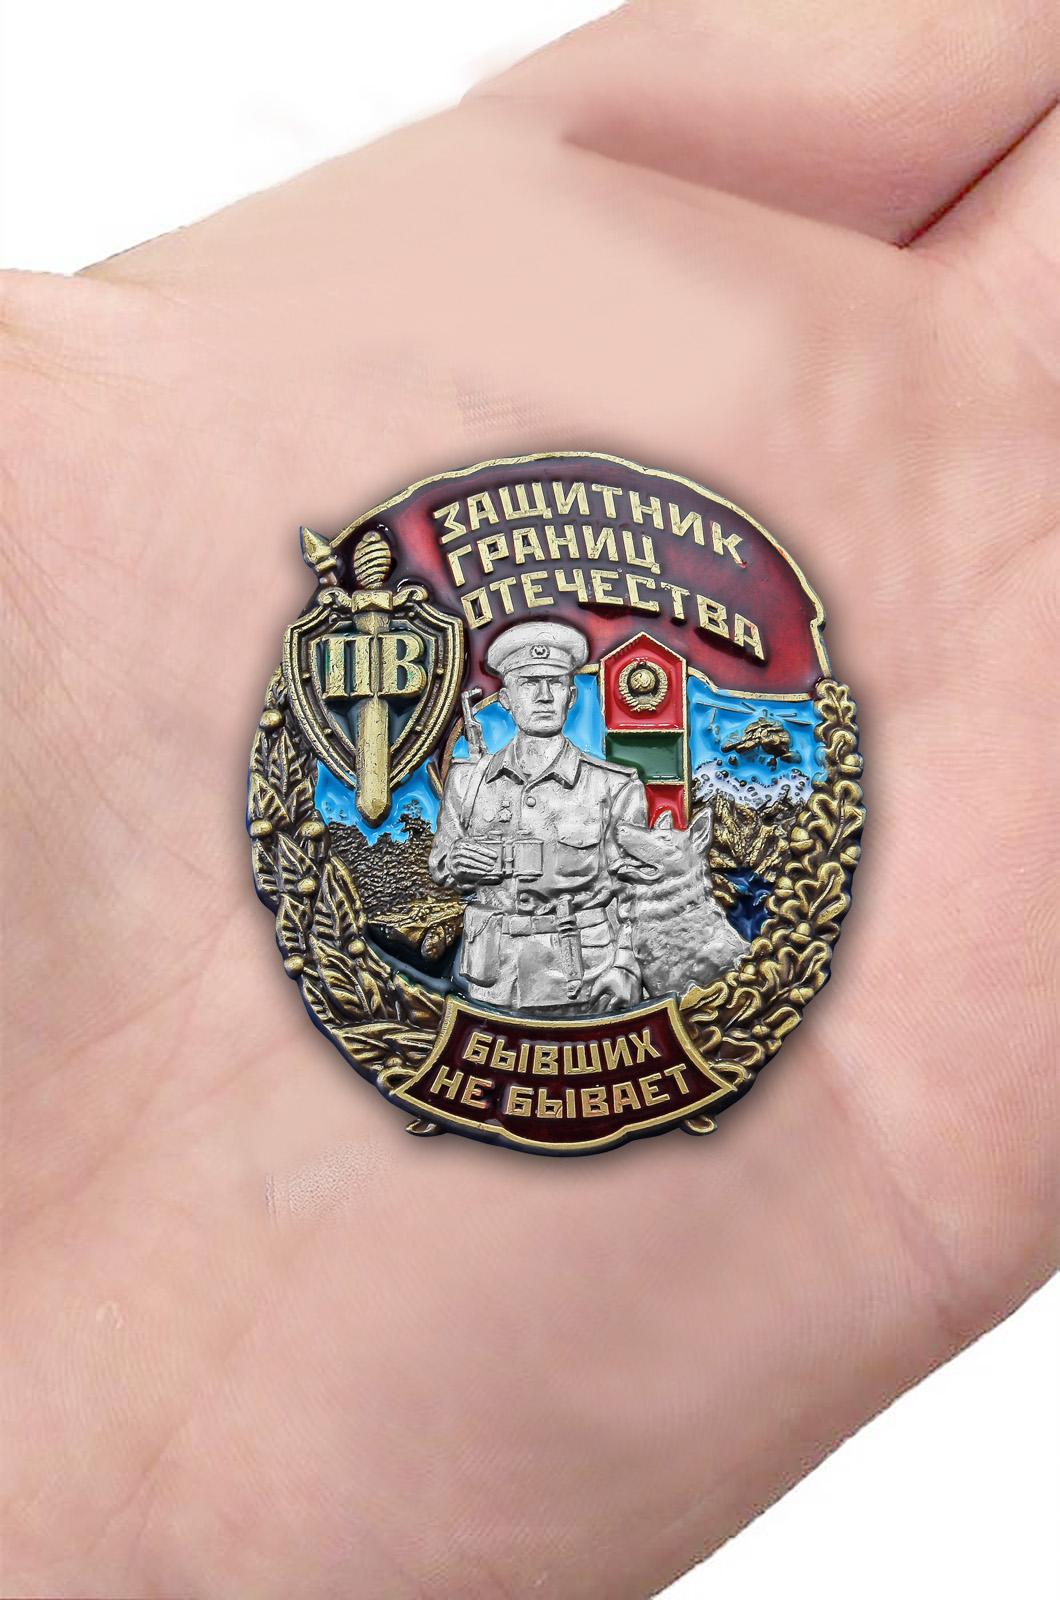 Наградной знак Защитник границ Отечества - вид на ладони